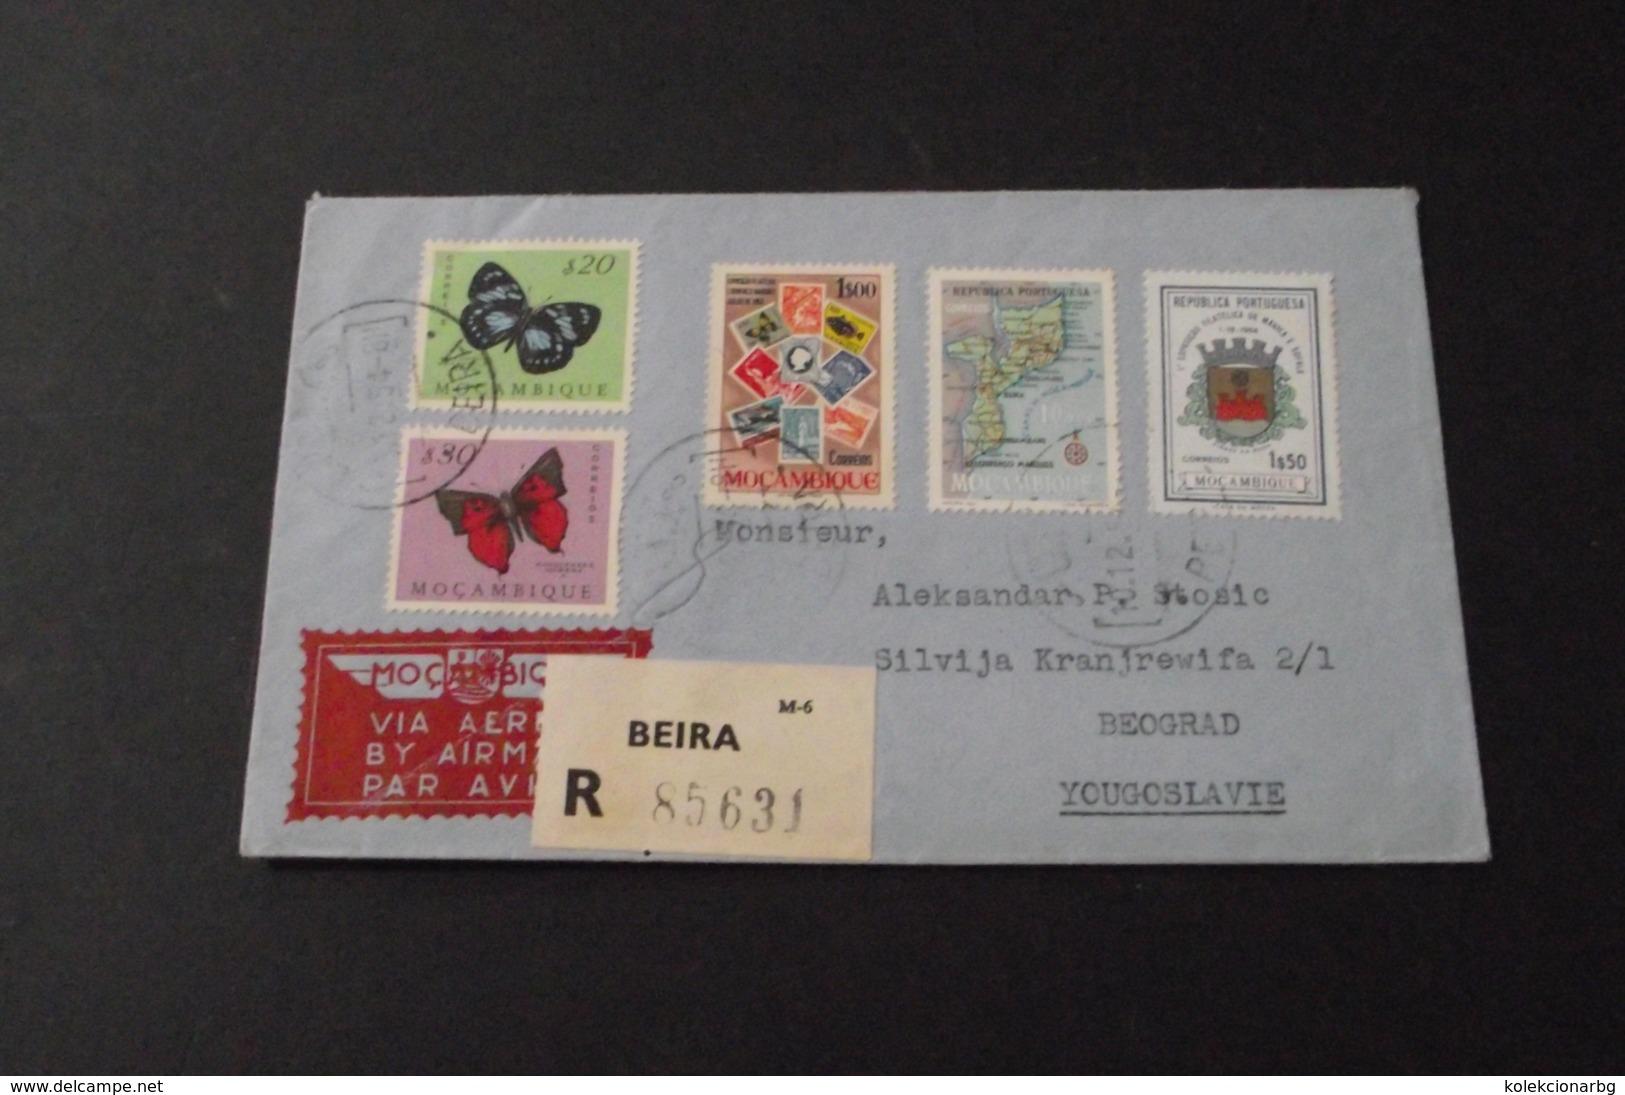 Avionsko Pismo Beira(Mozzambika)-Beograd(Yugoslavija) 1954.   Airmail Letter Mocambique-Yougoslavie - Covers & Documents